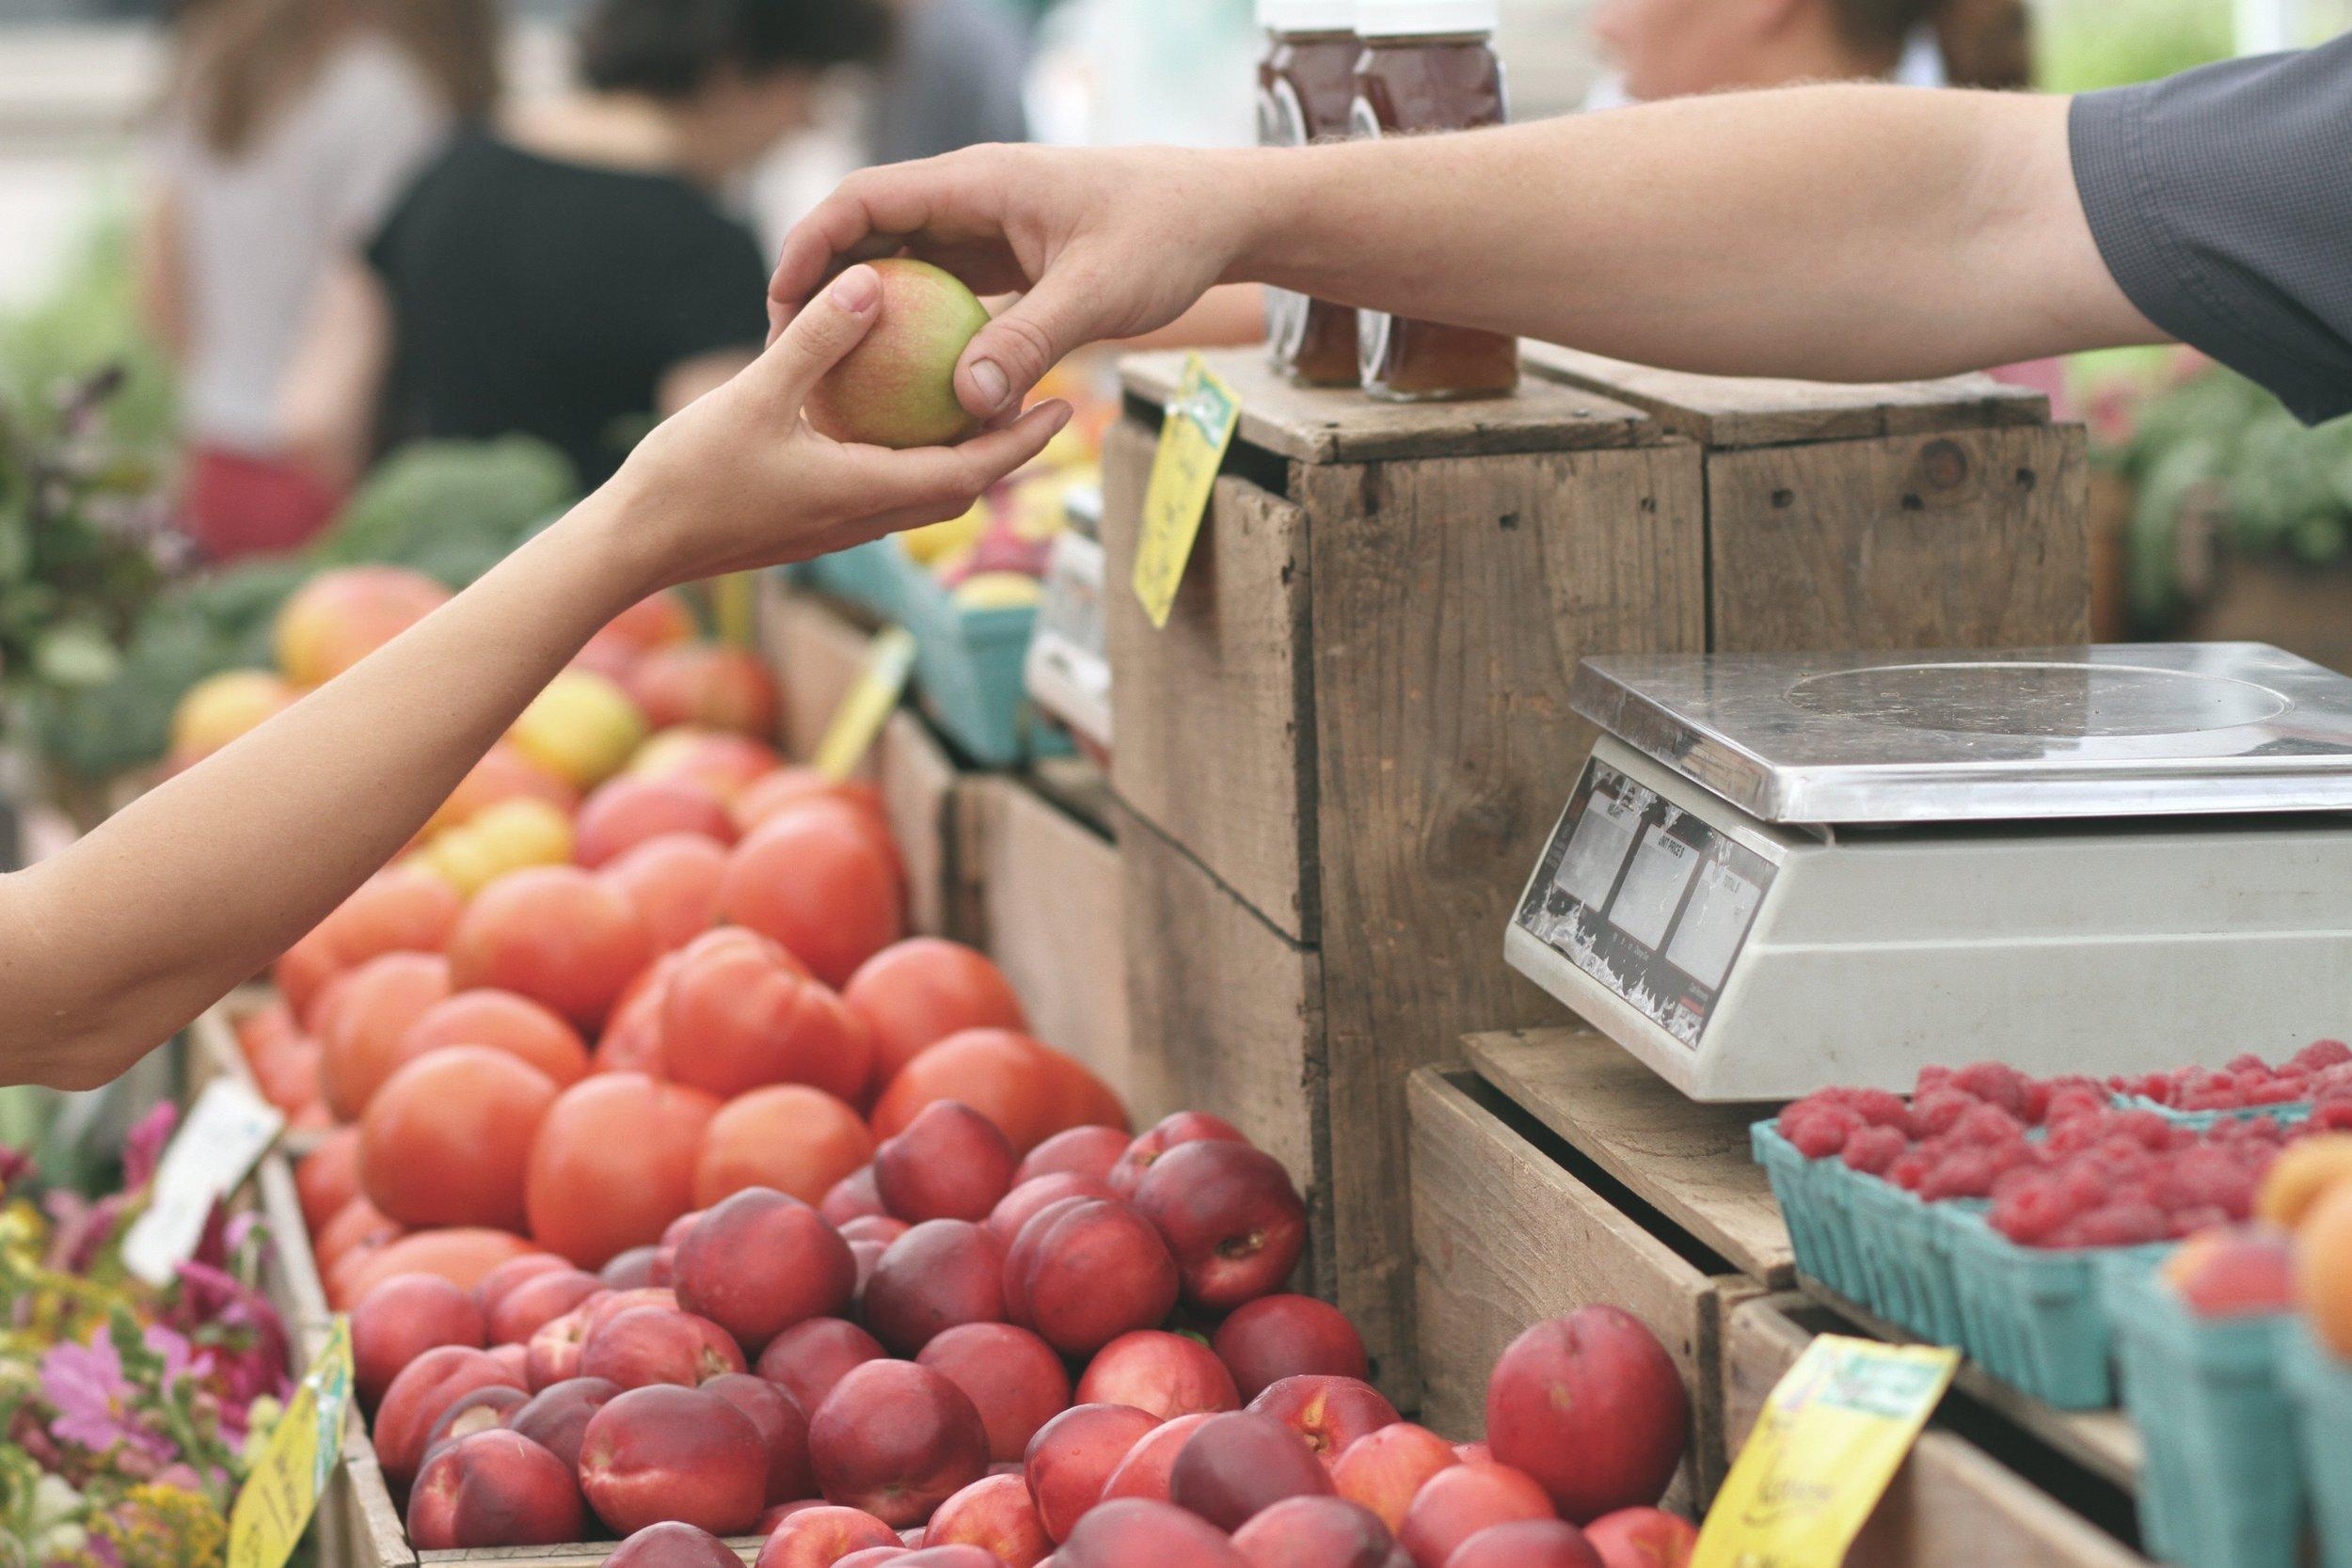 uwm.organic.budget.apples-business-buy-deal-farmers-market-fruits-1366143-pxhere.com.jpg